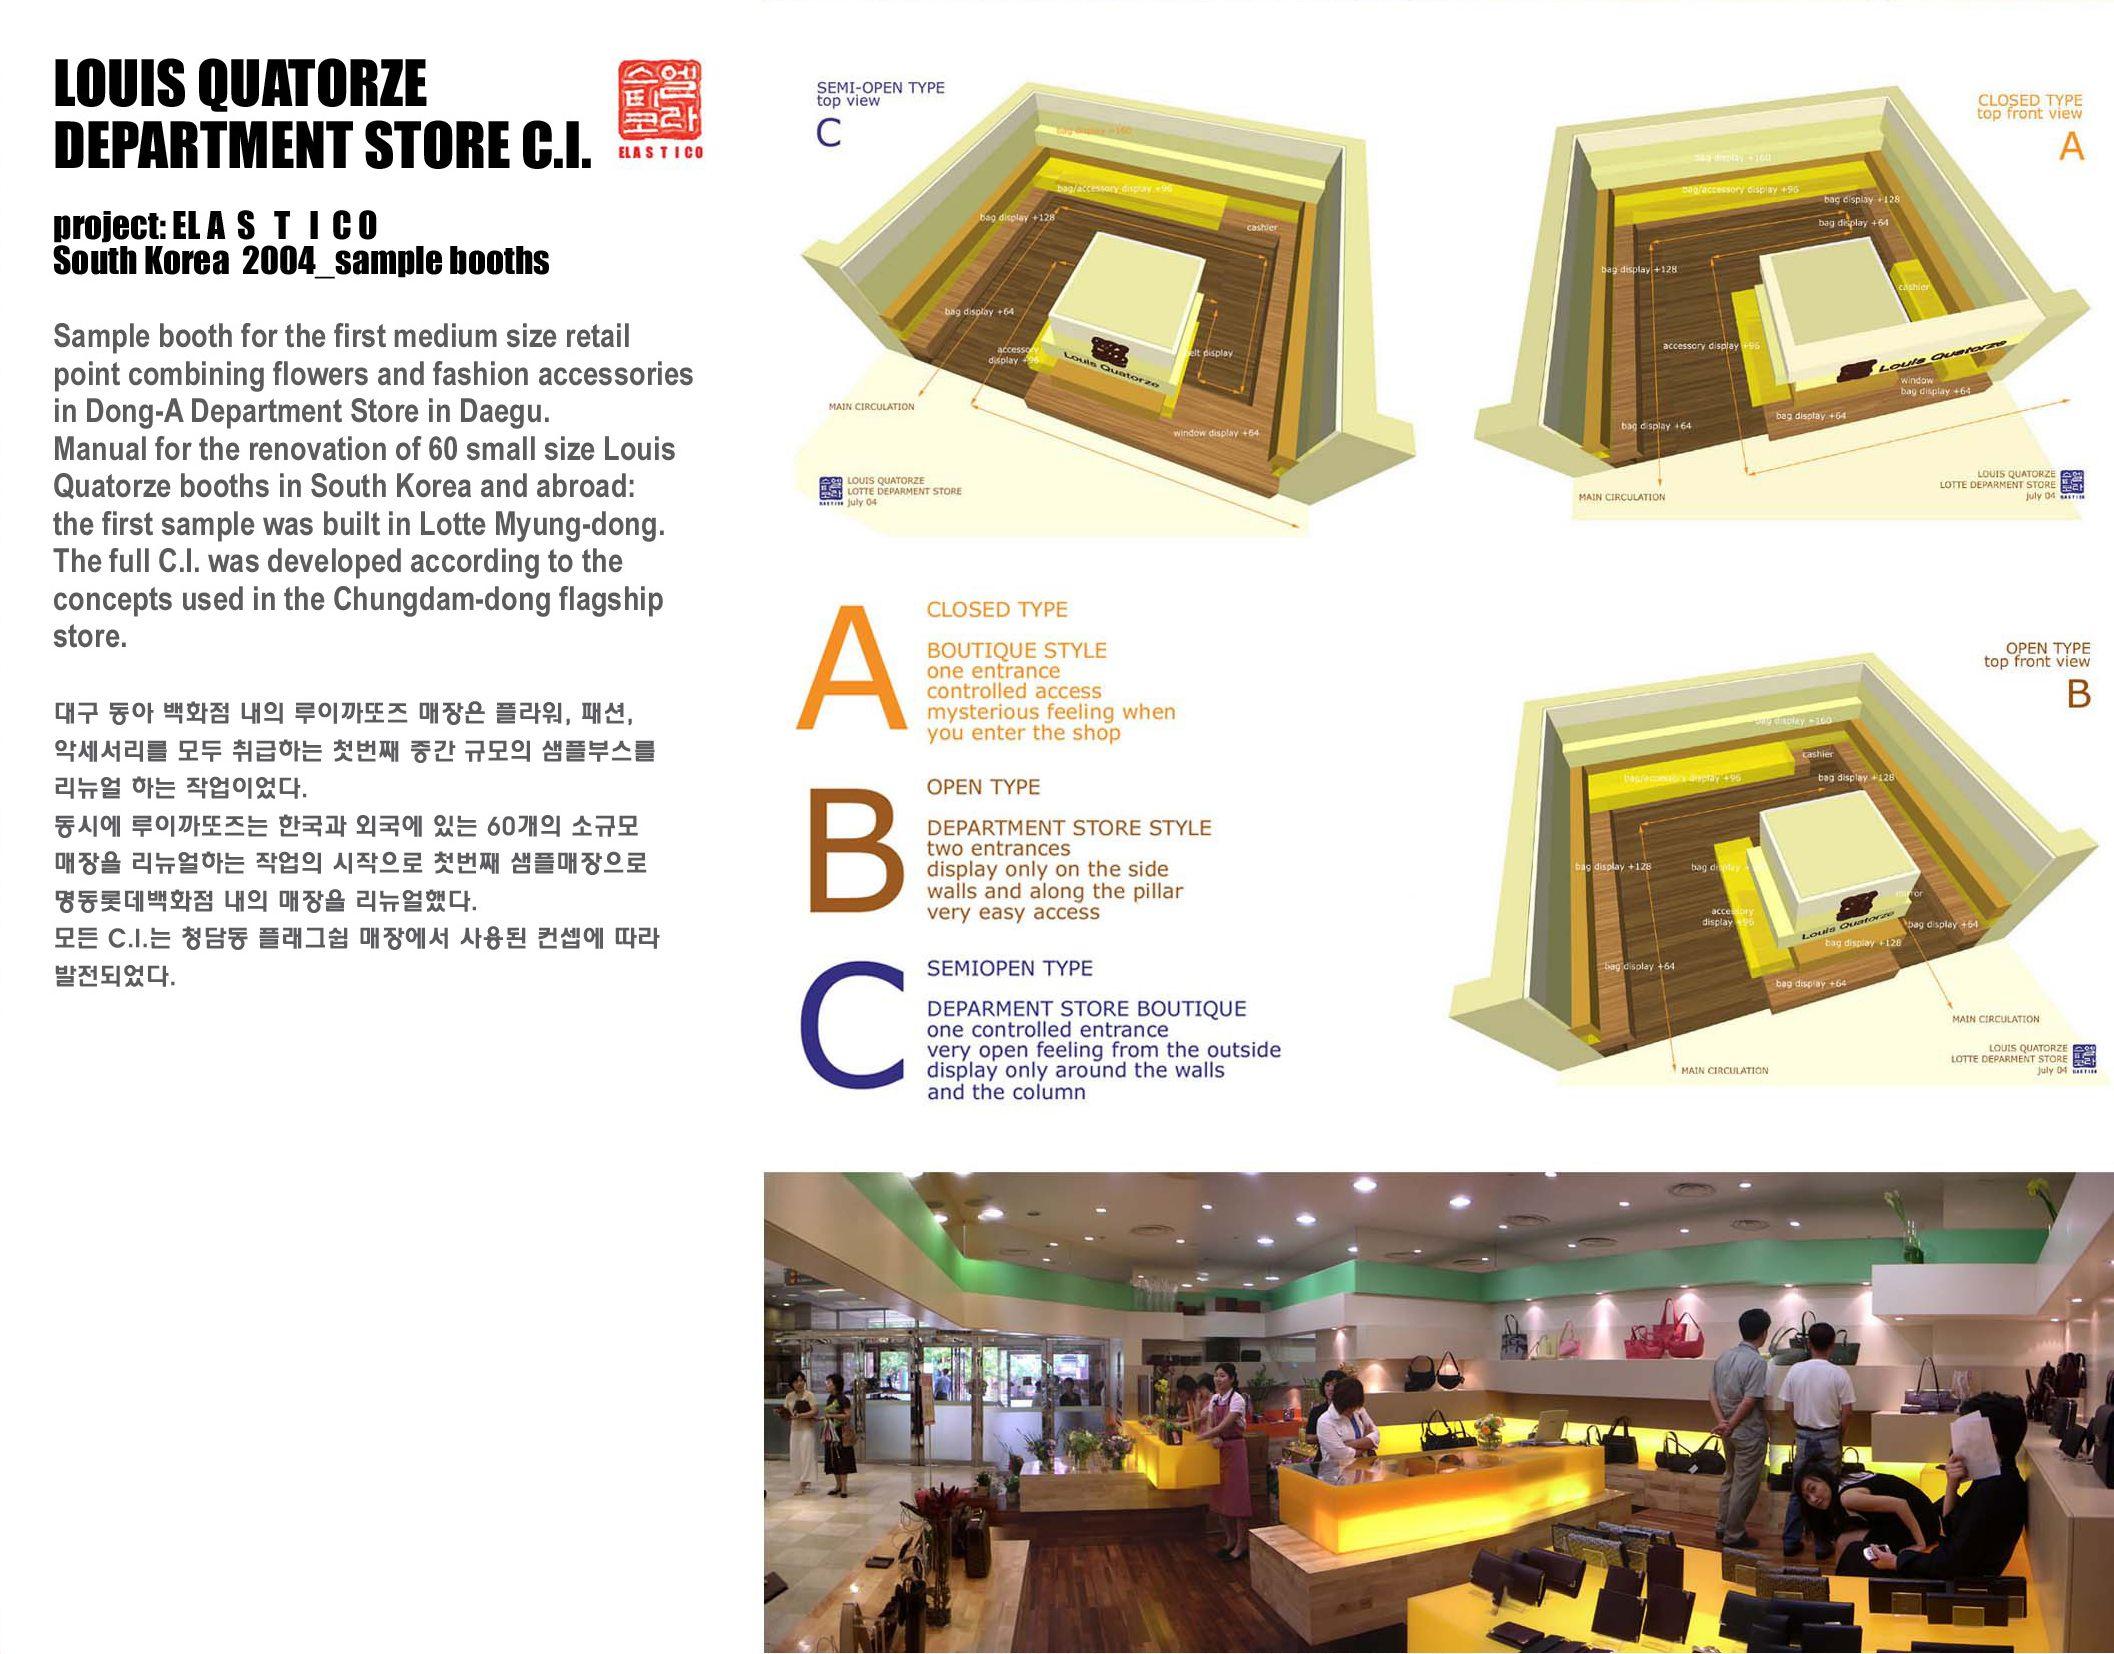 20 louis14 department cover.jpg